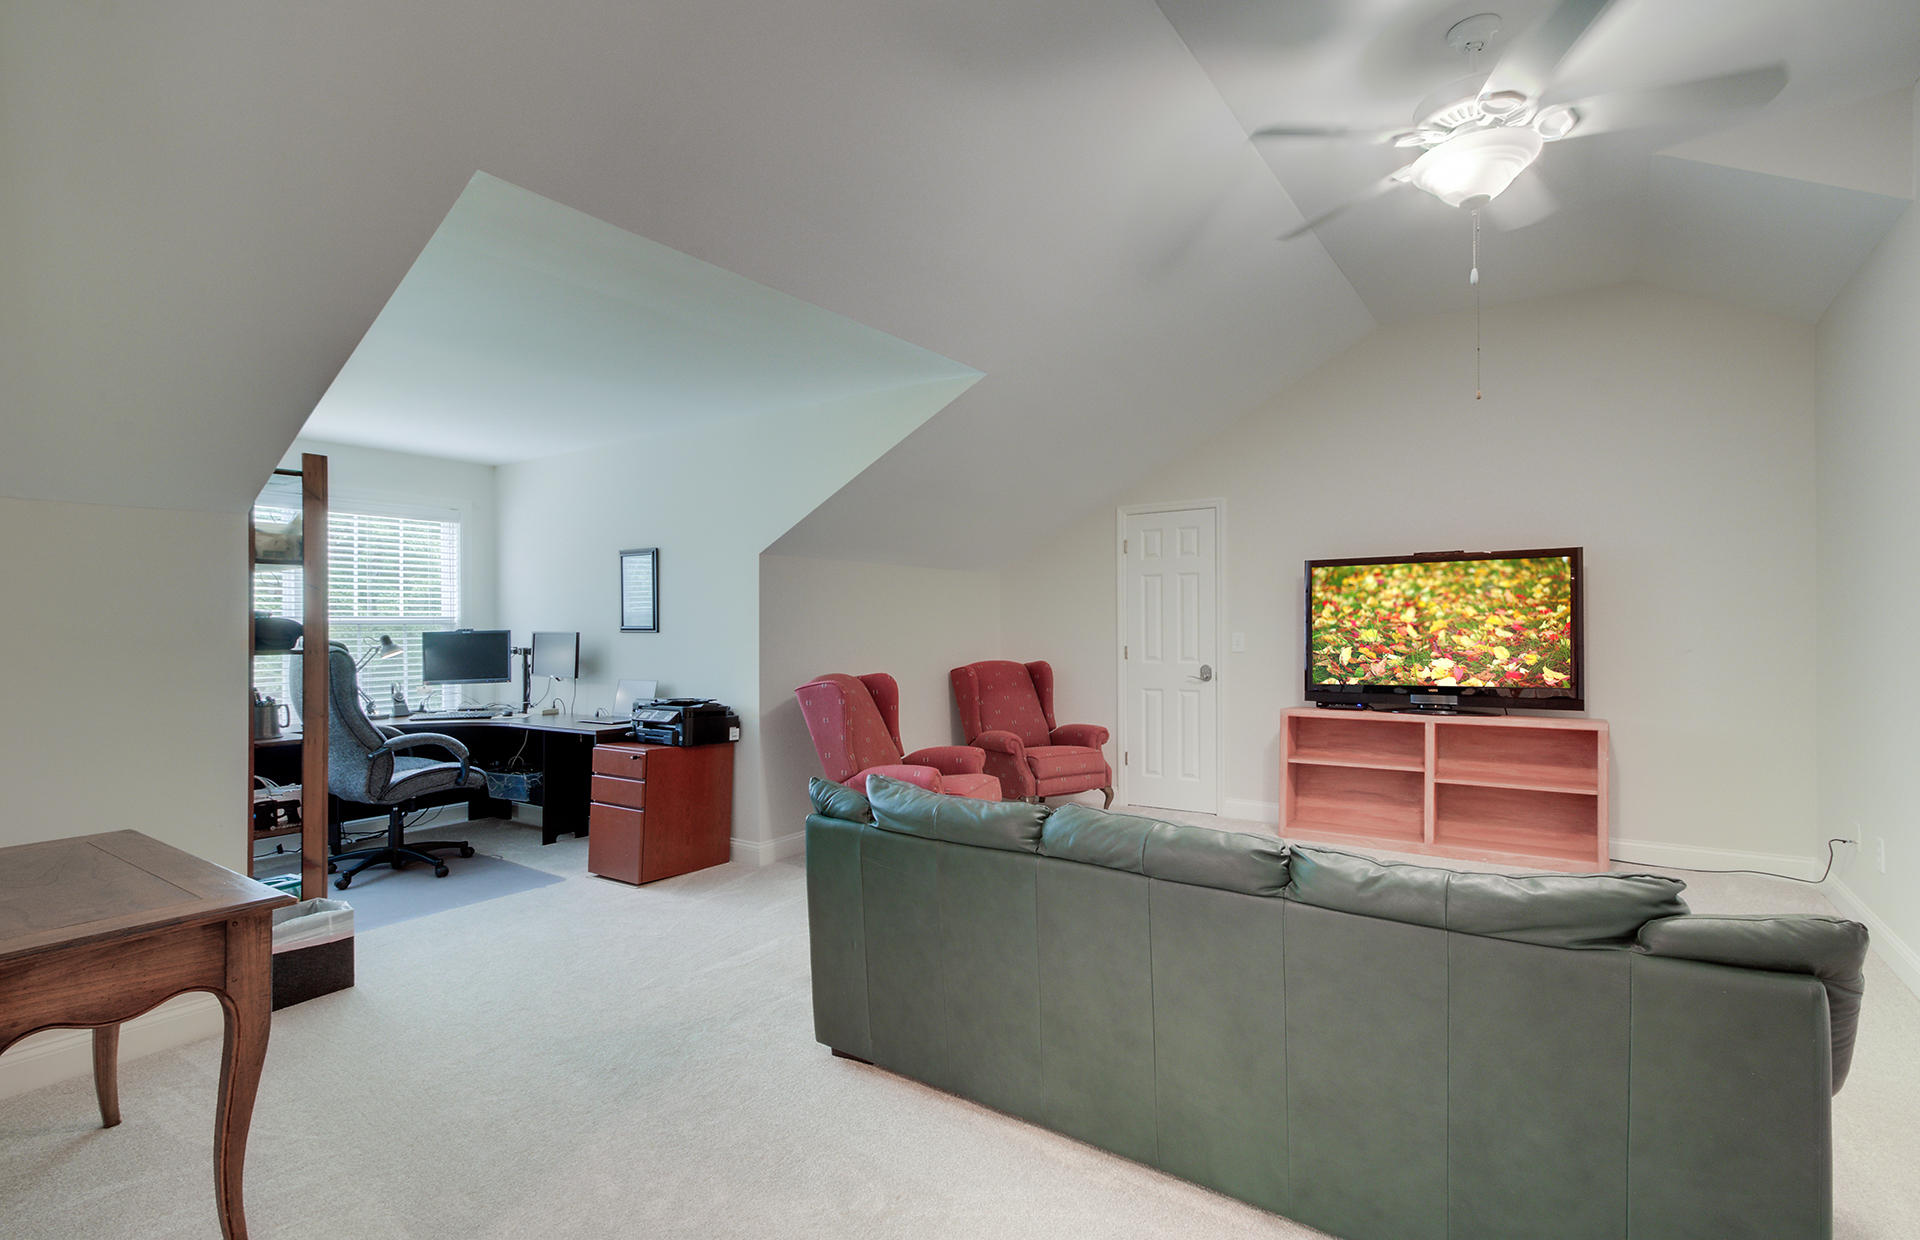 Dunes West Homes For Sale - 2453 Darts Cove, Mount Pleasant, SC - 21